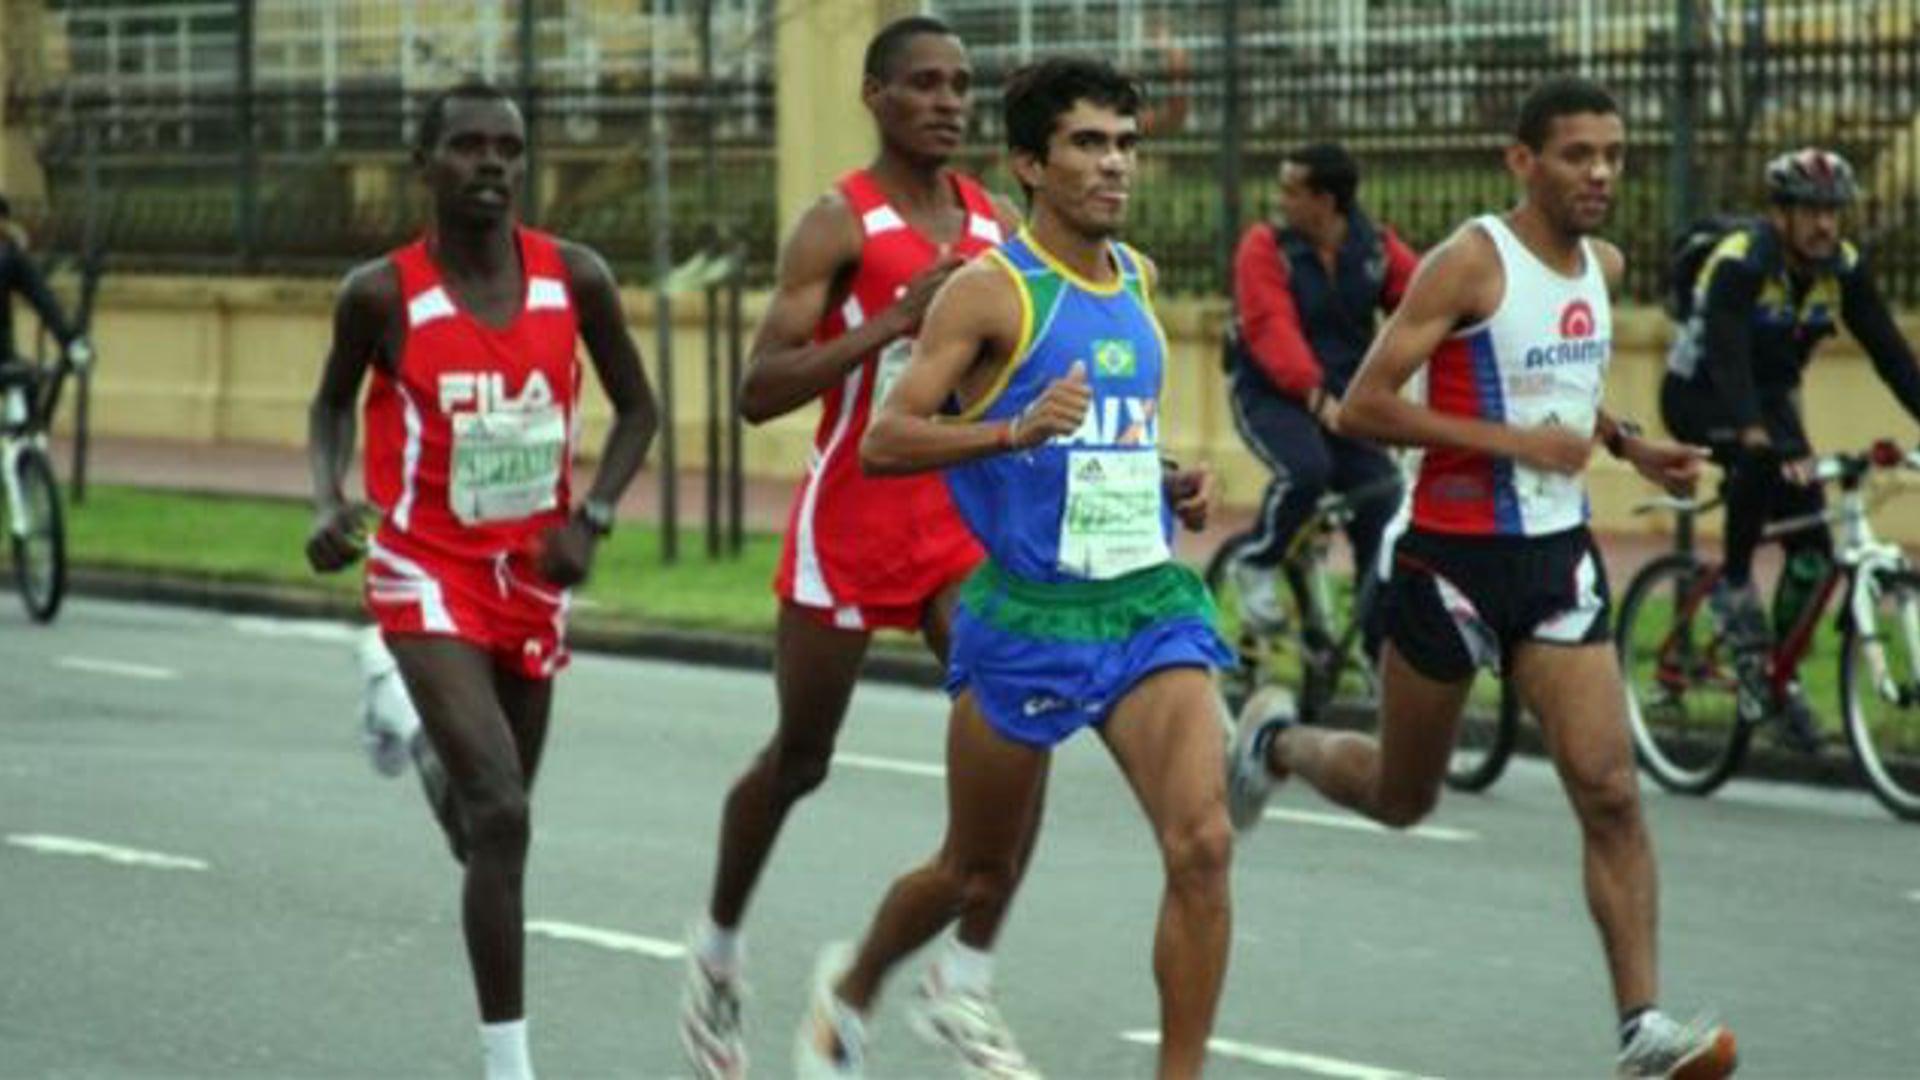 Buenos Aires Marathon [stop motion]